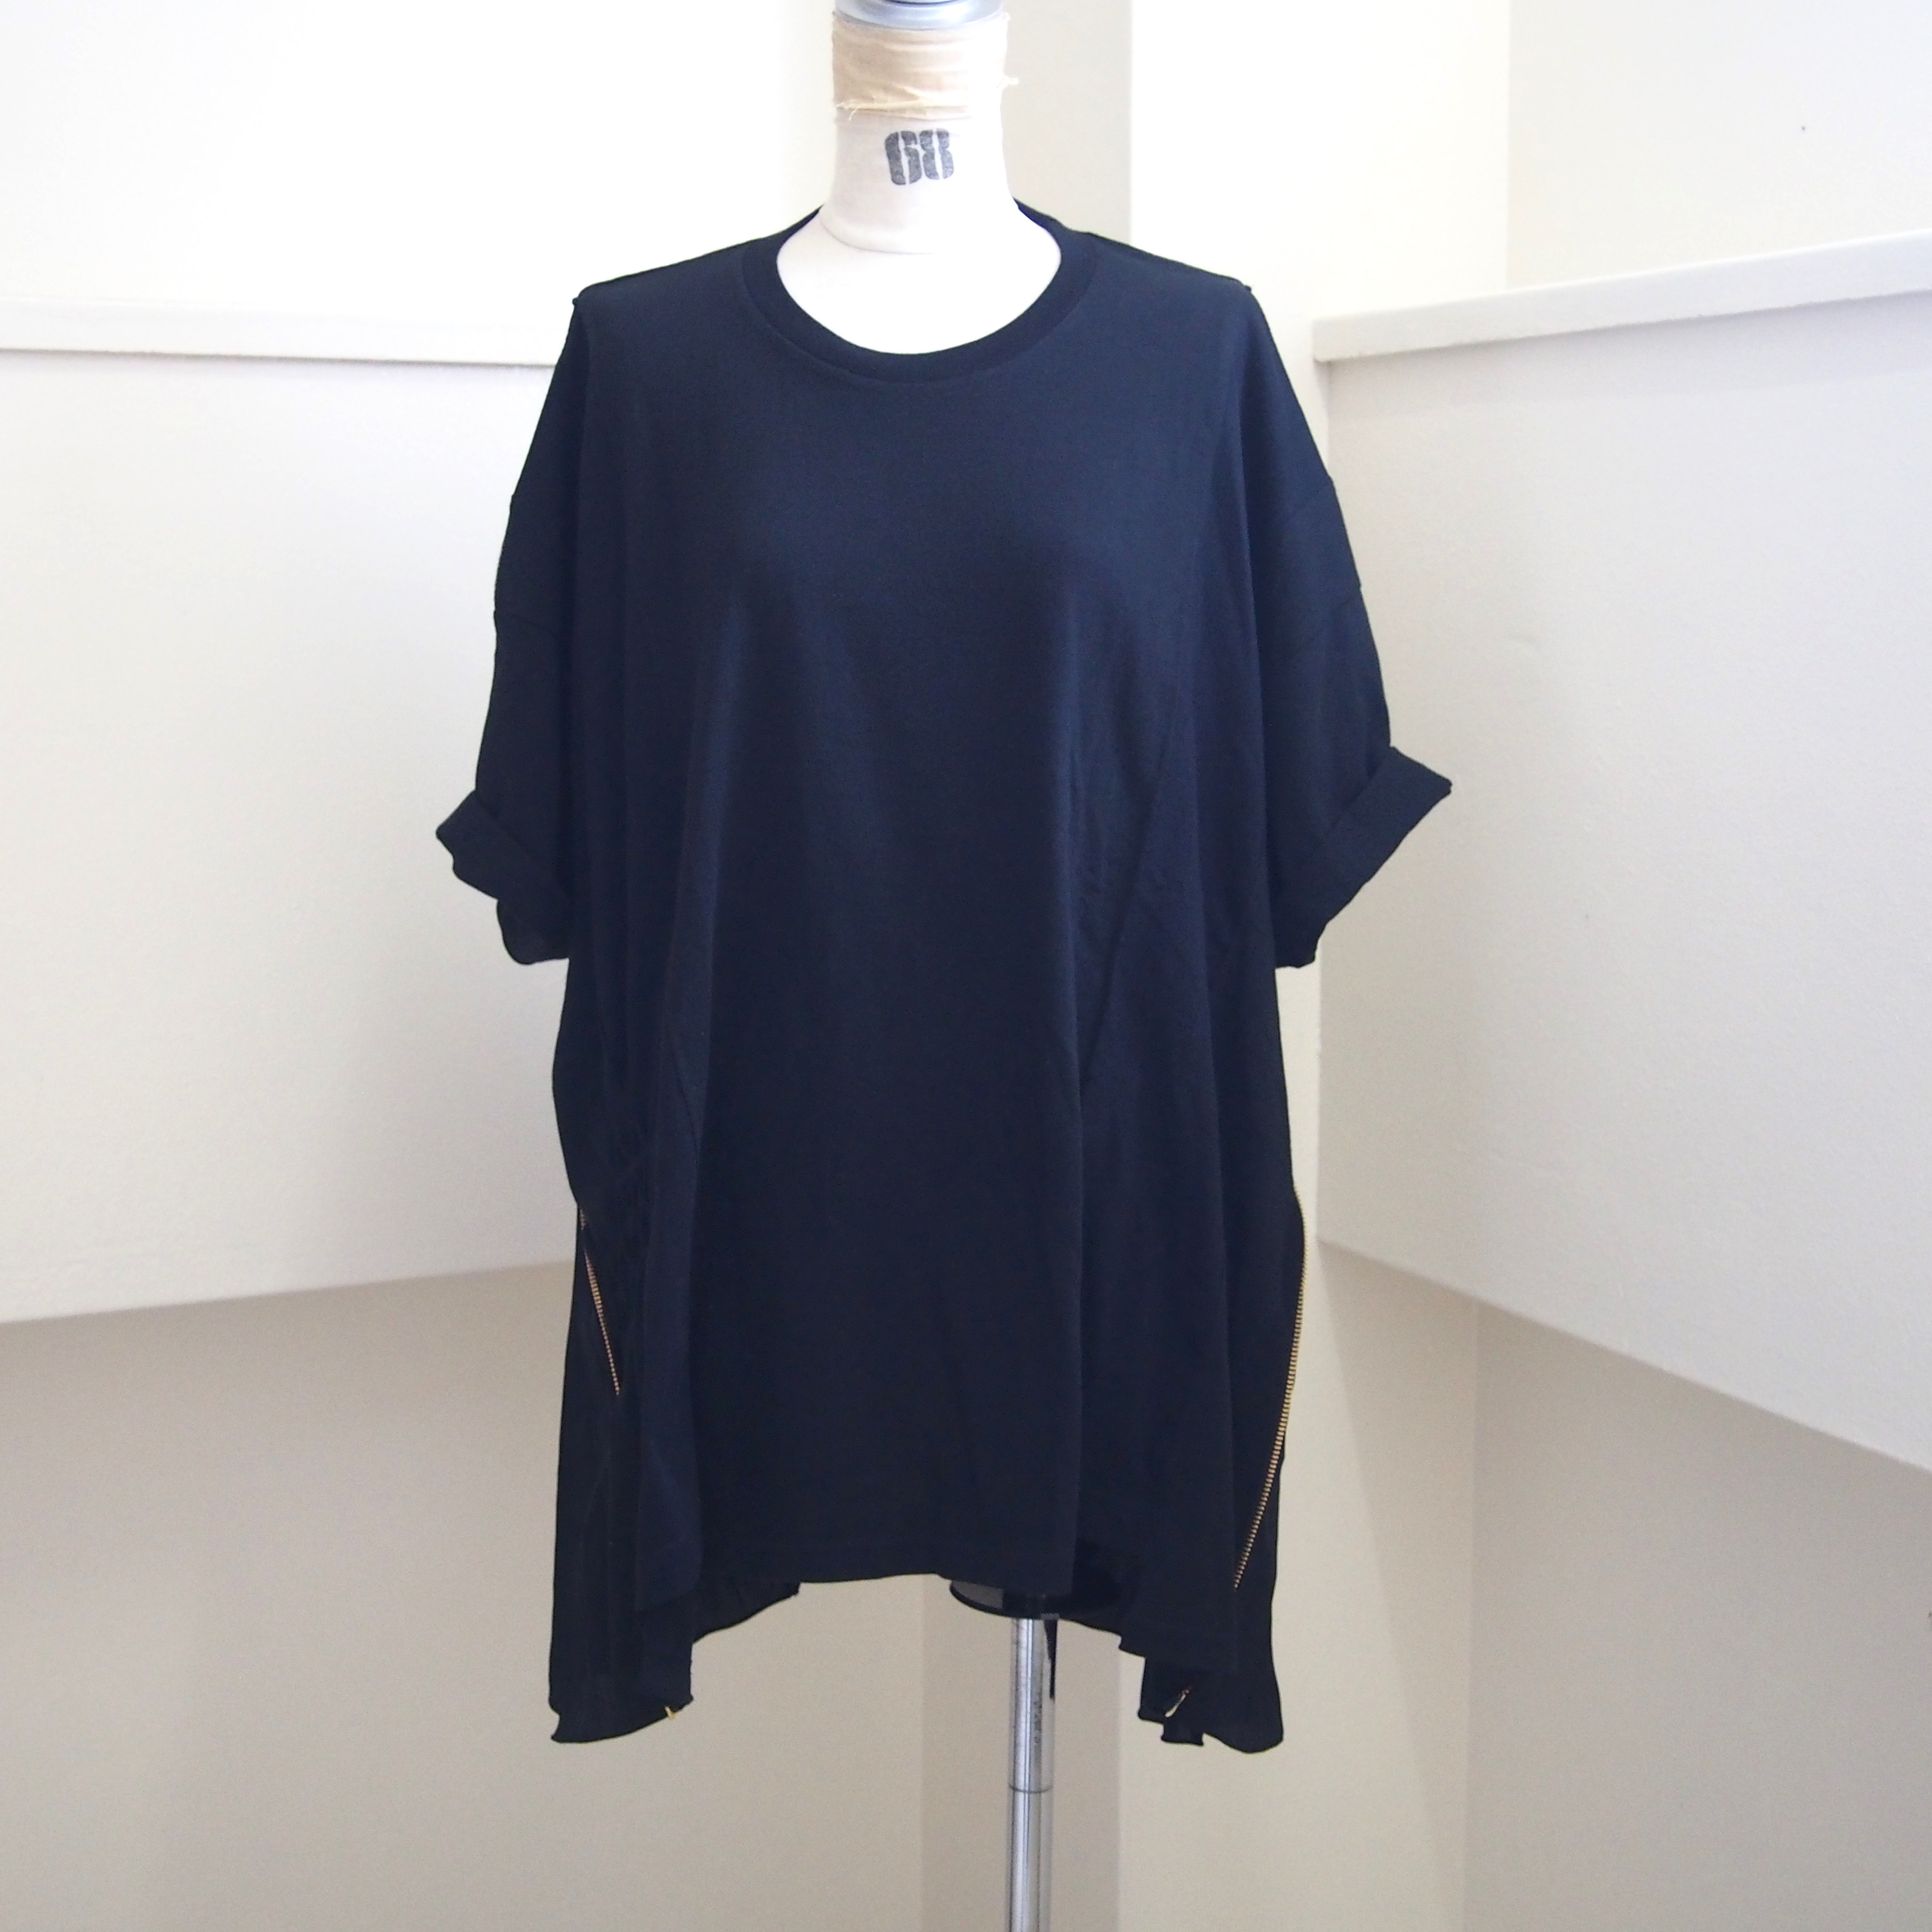 【sandglass】smocking t-shirt(Black) / 【サンドグラス】スモッキング Tシャツ(ブラック)